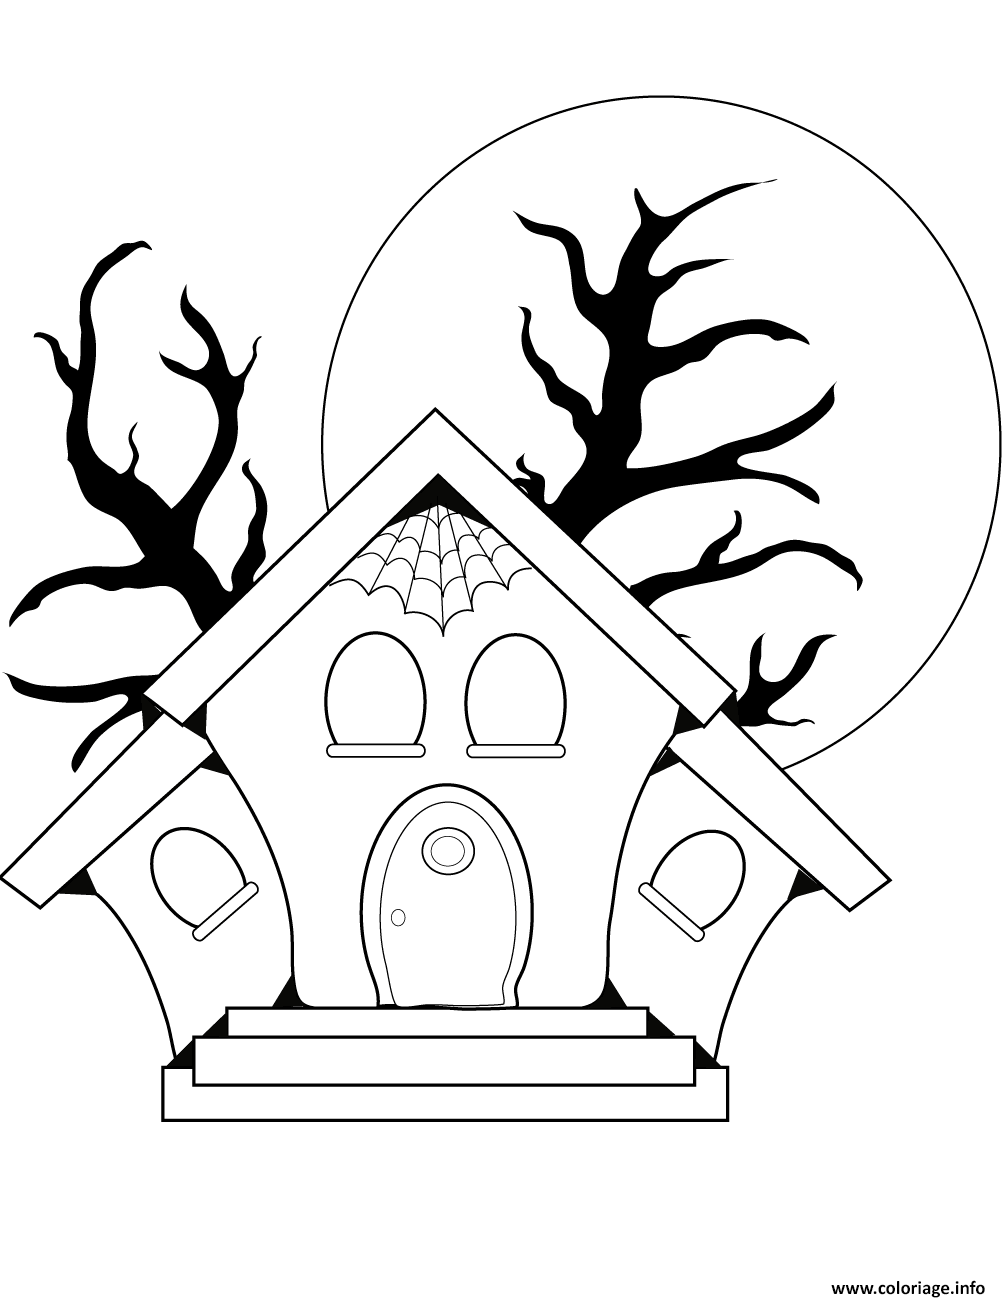 Coloriage Maison Hantee Halloween Dessin